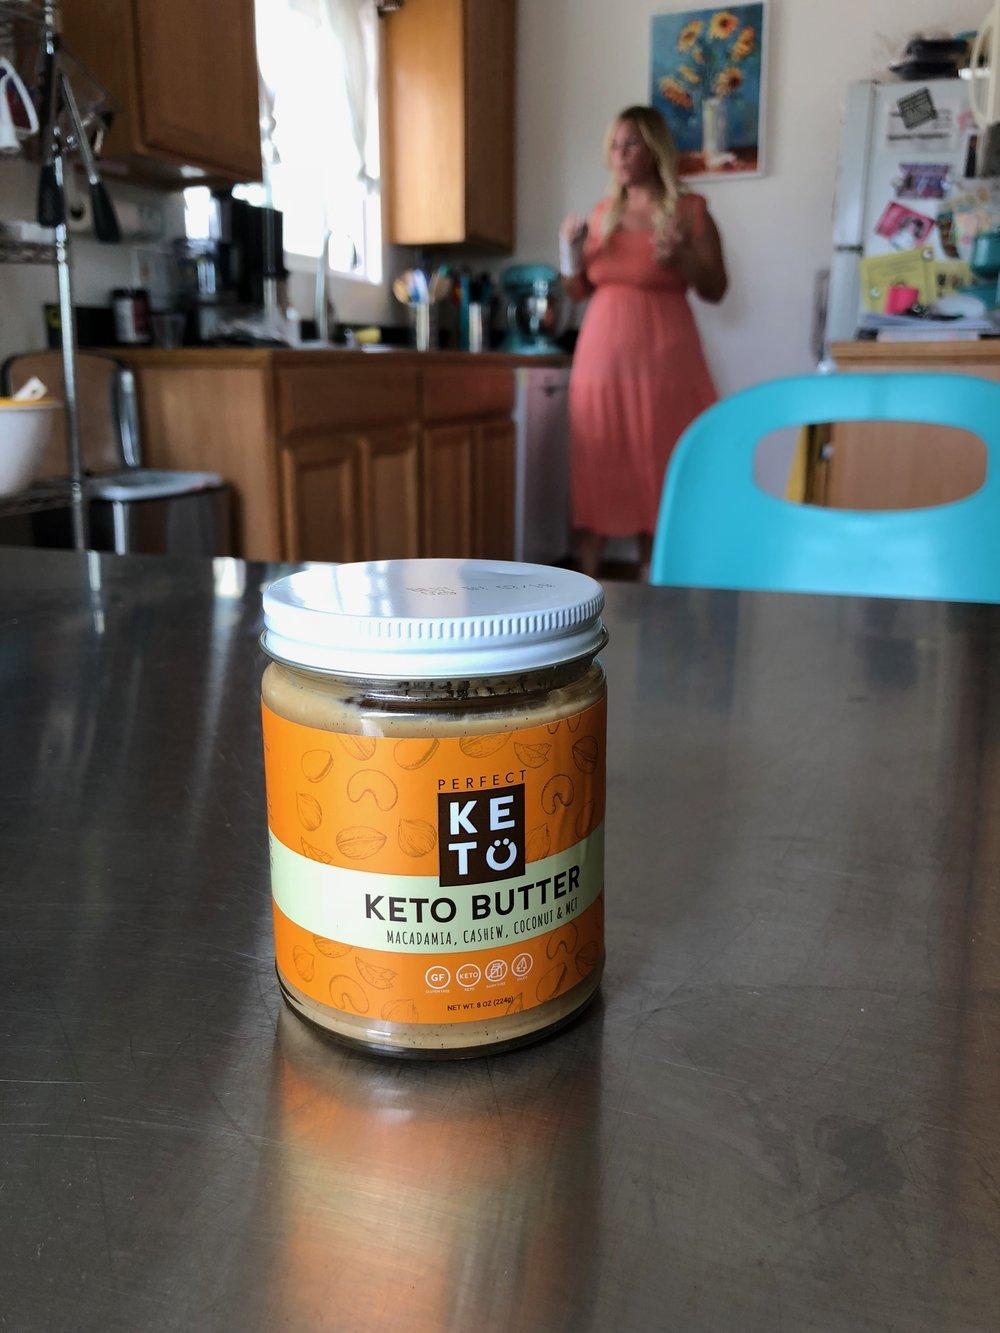 perfect keto nut